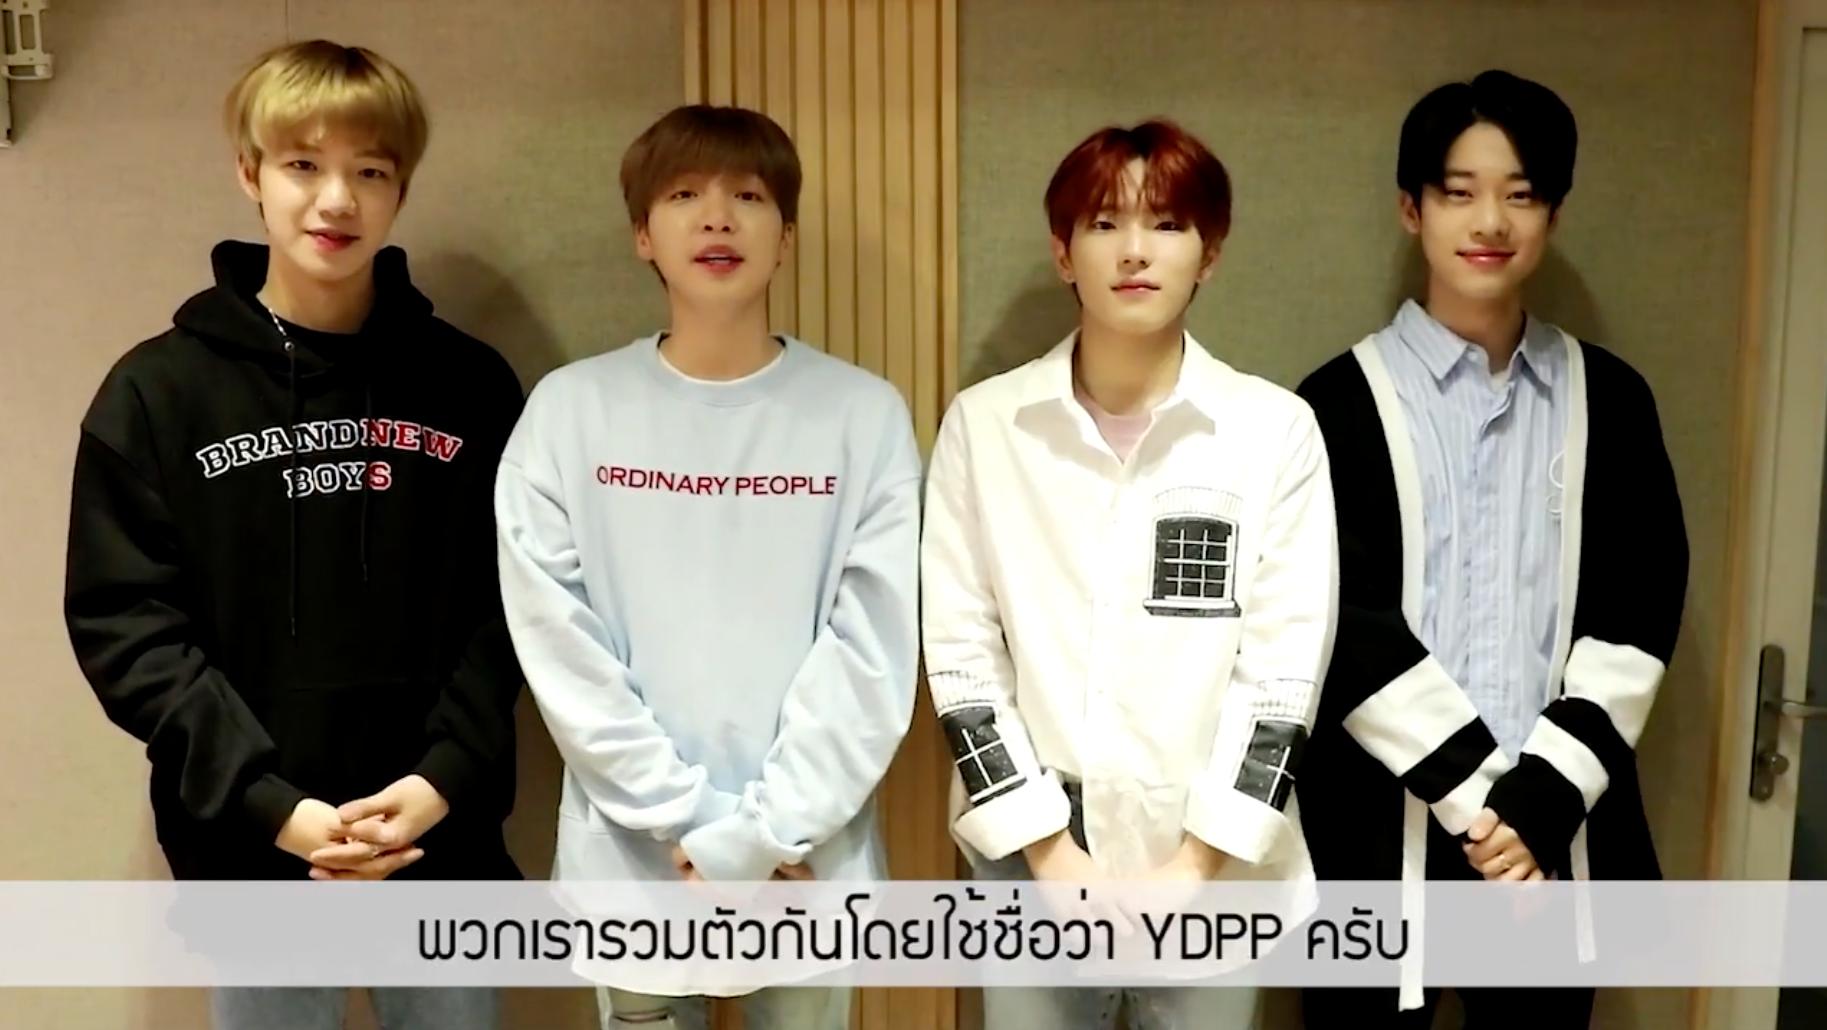 YDPP LOVE IT LIVE IT IN BANGKOK 2018